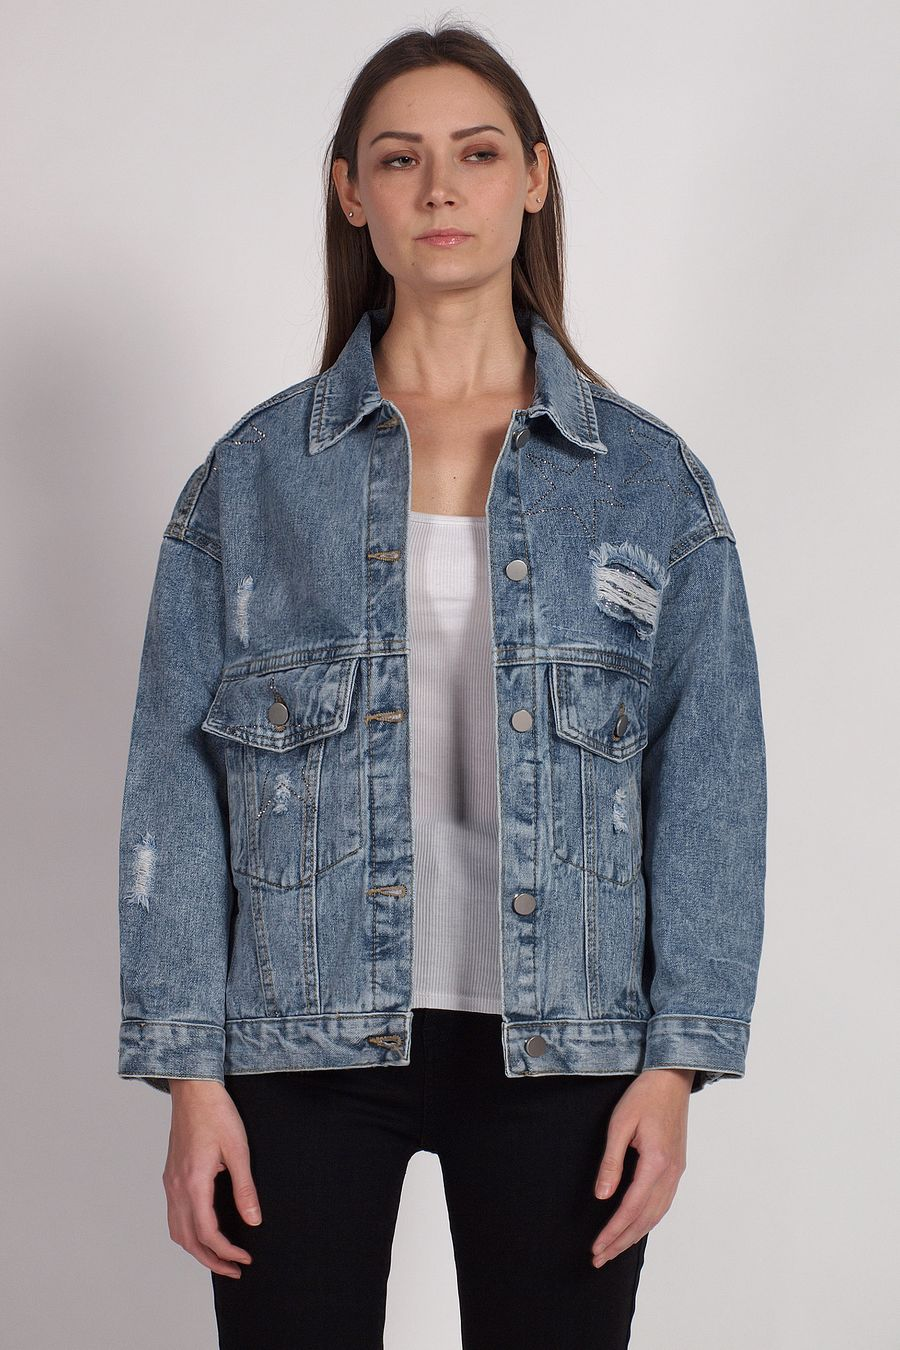 Жакет женский (джинсовка) LRZBS 2059 - фото 1